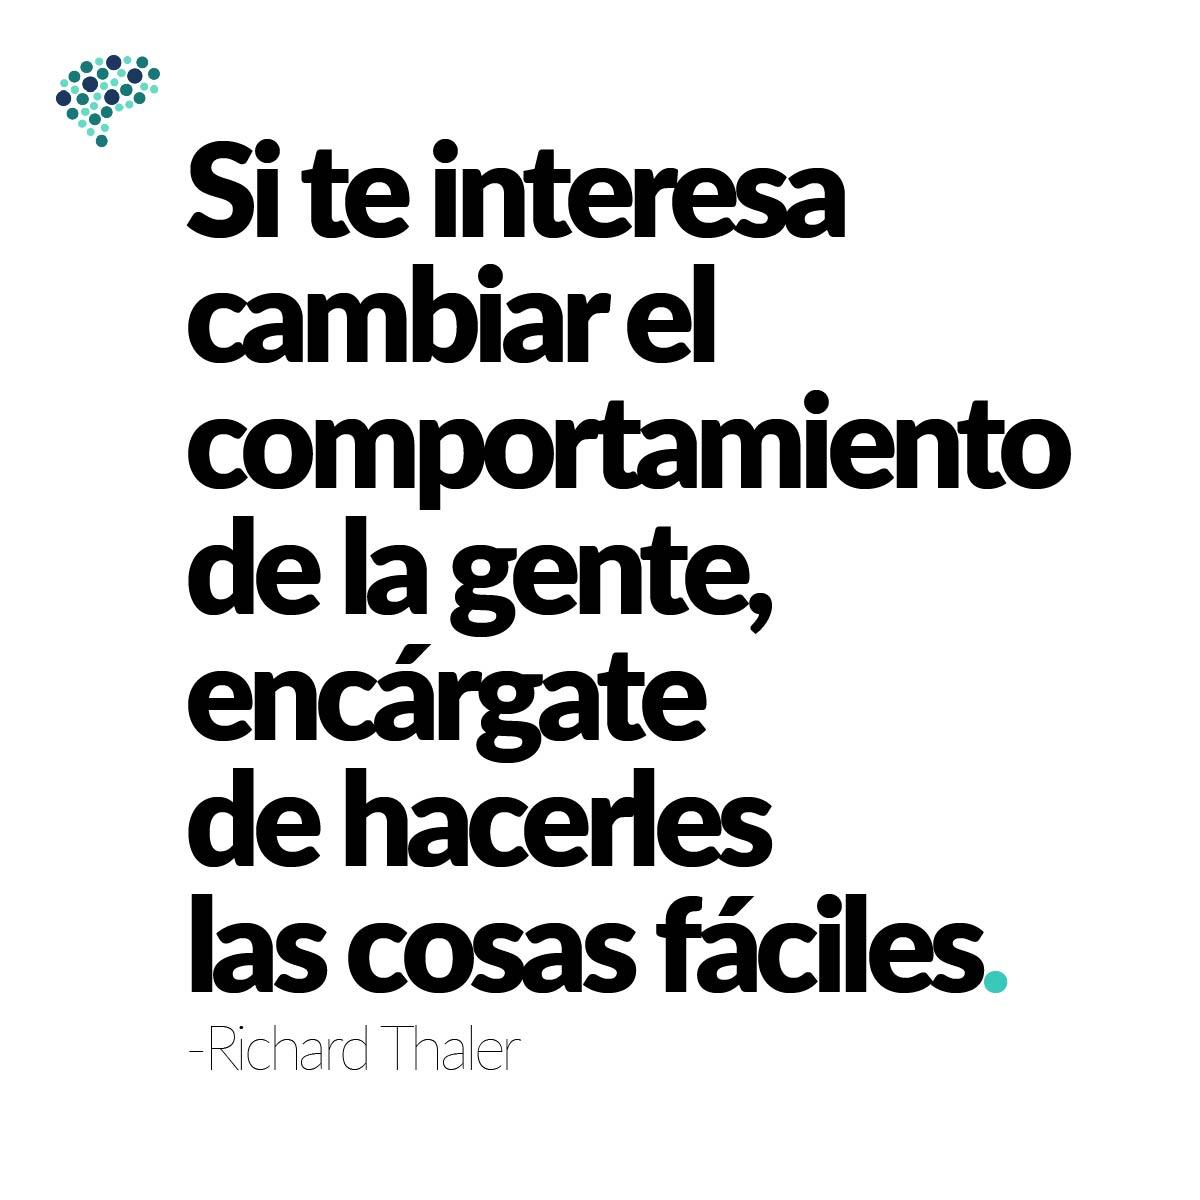 Richard Thaler_2.jpg